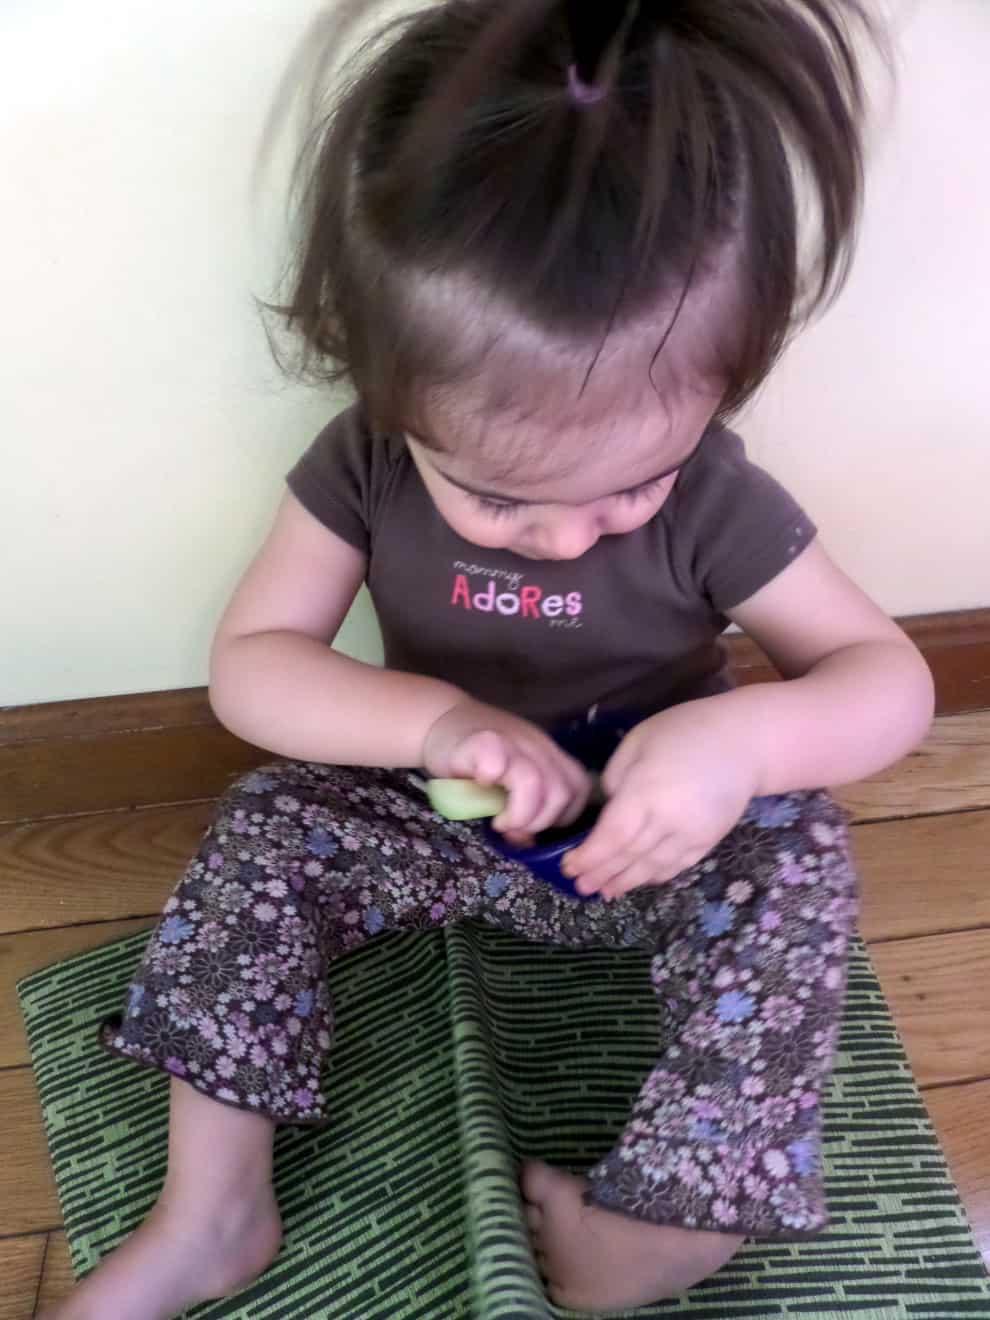 Baby Genevieve snacking on Peanut Butter apple celery dip